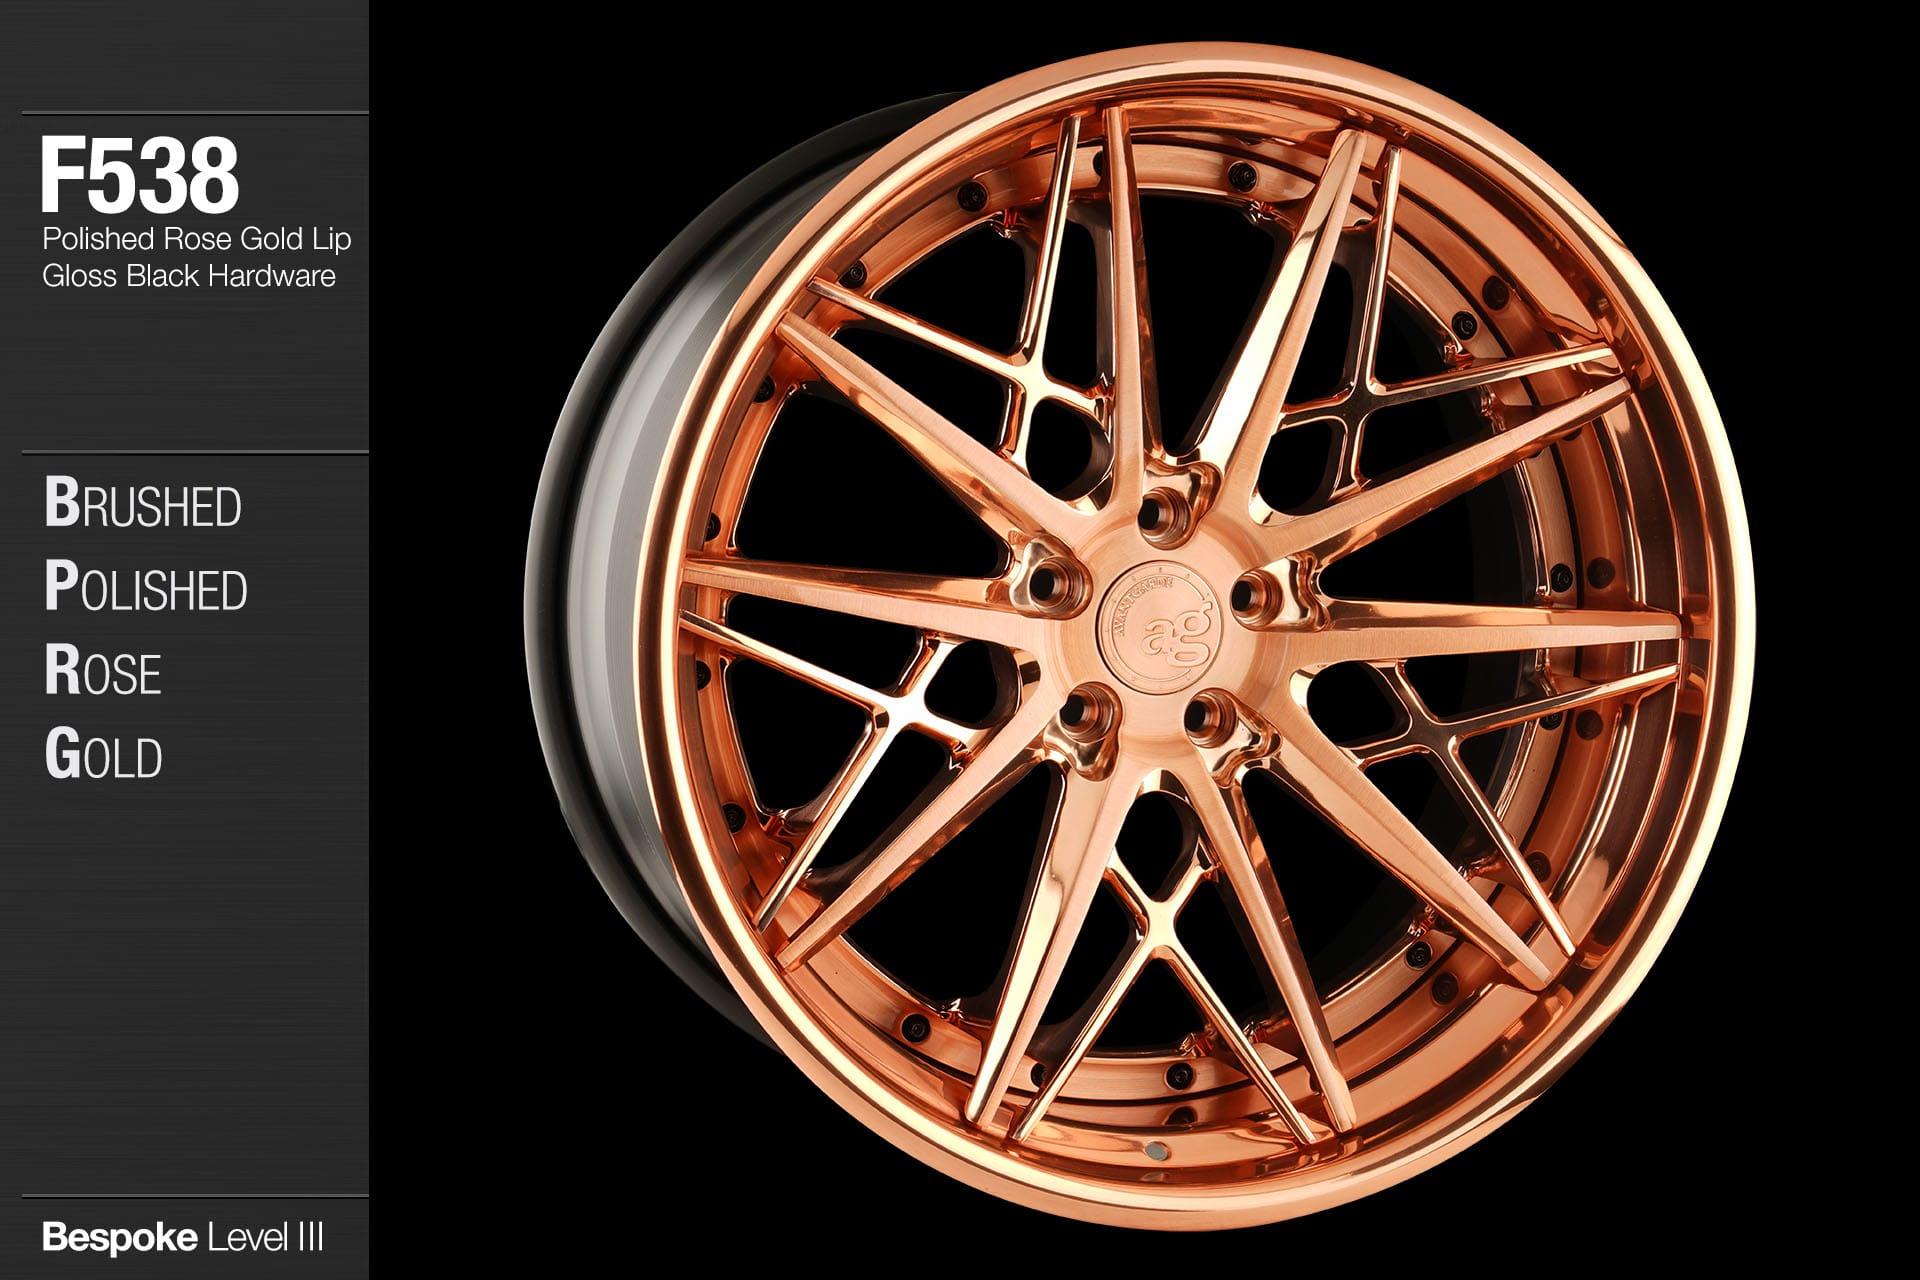 Avant Garde Wheels Ag F Brushed Polished Rose Gold Face Lip Gloss Black Hardware